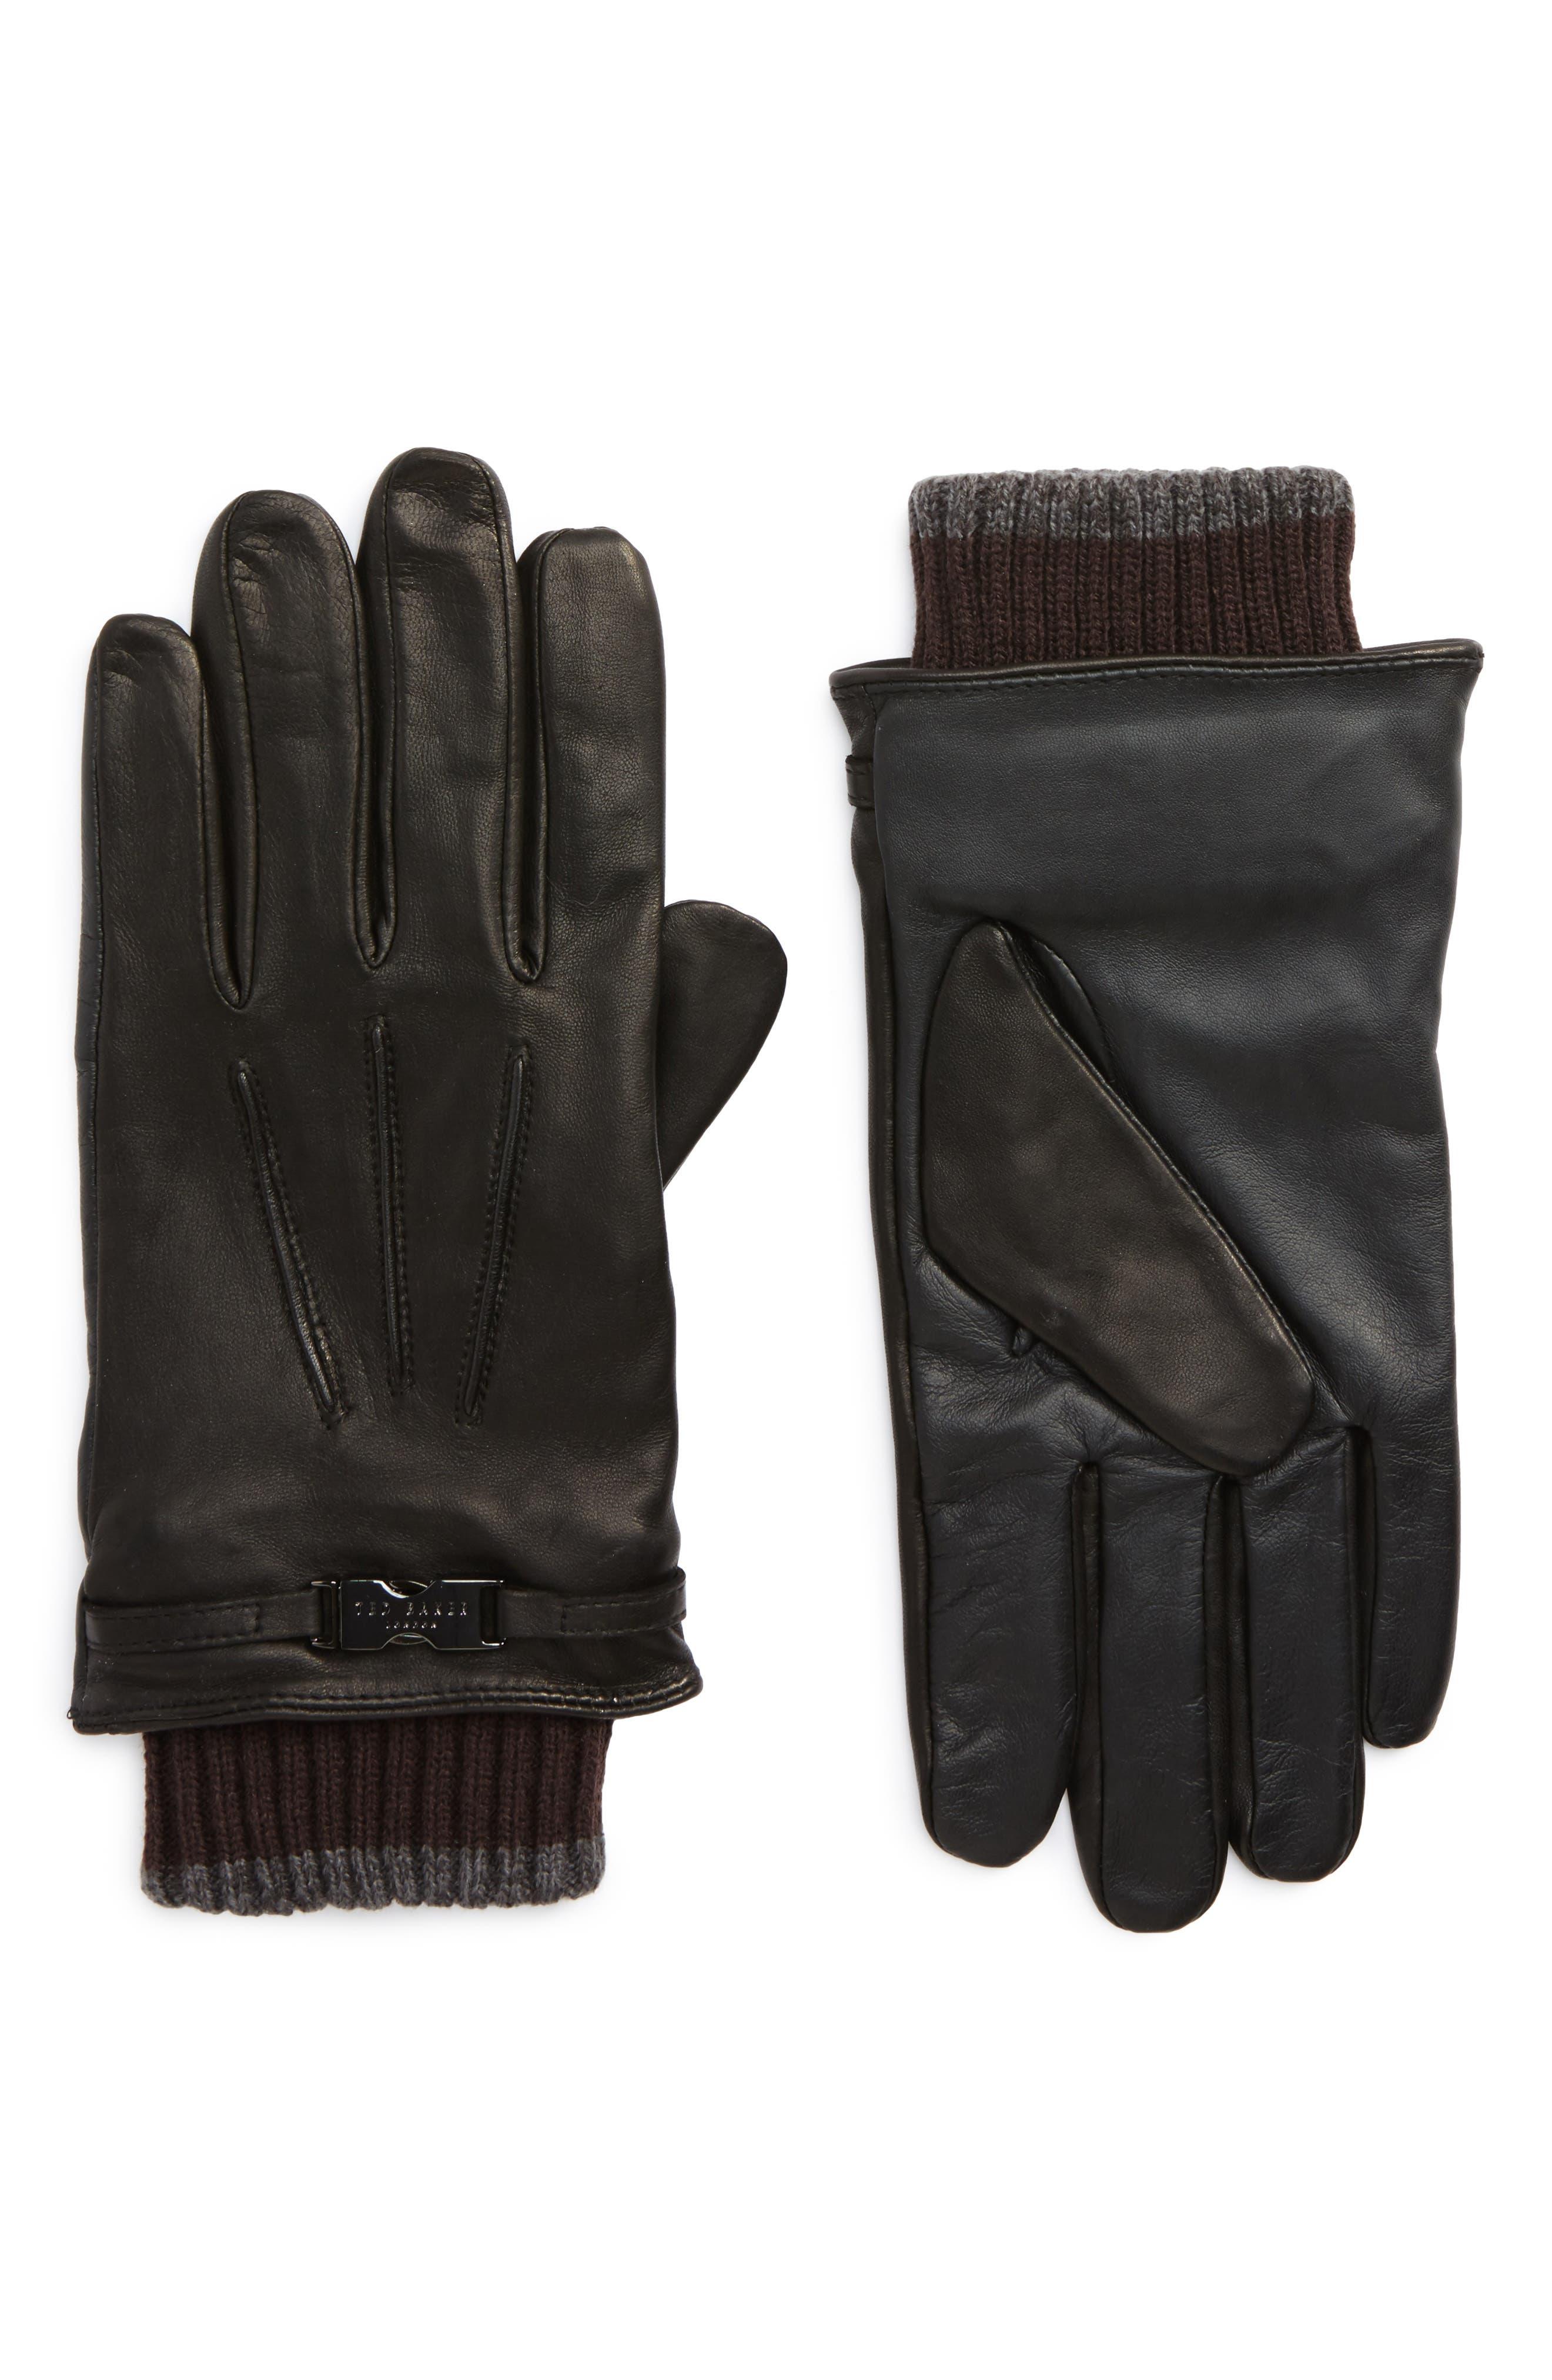 Quiff Leather Gloves,                         Main,                         color, Black